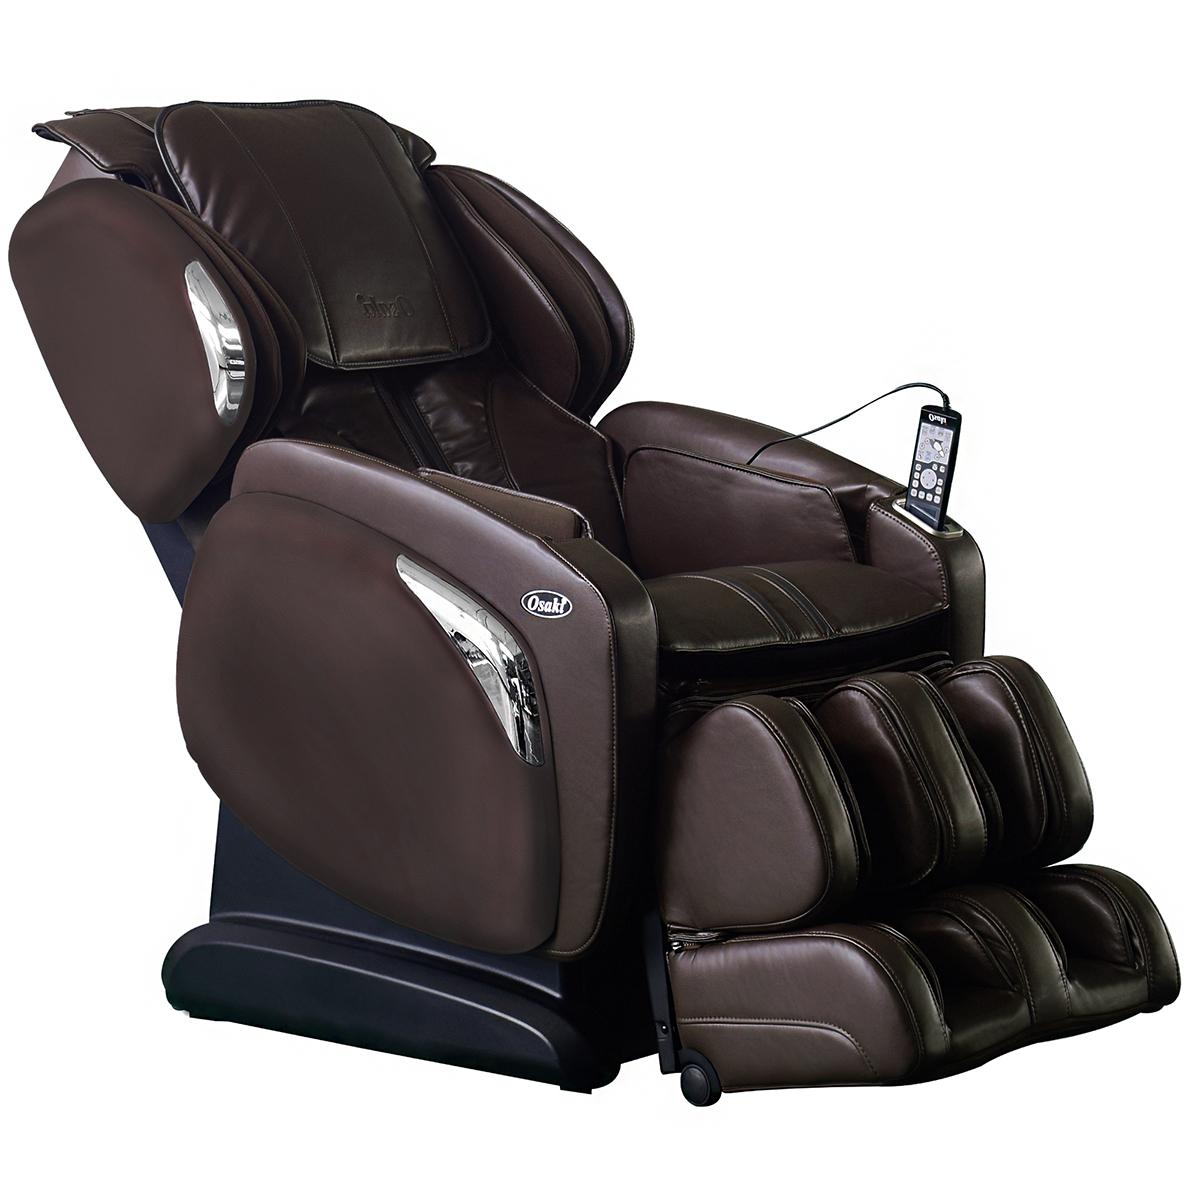 Osaki Massage Chair - Osaki OS-3700